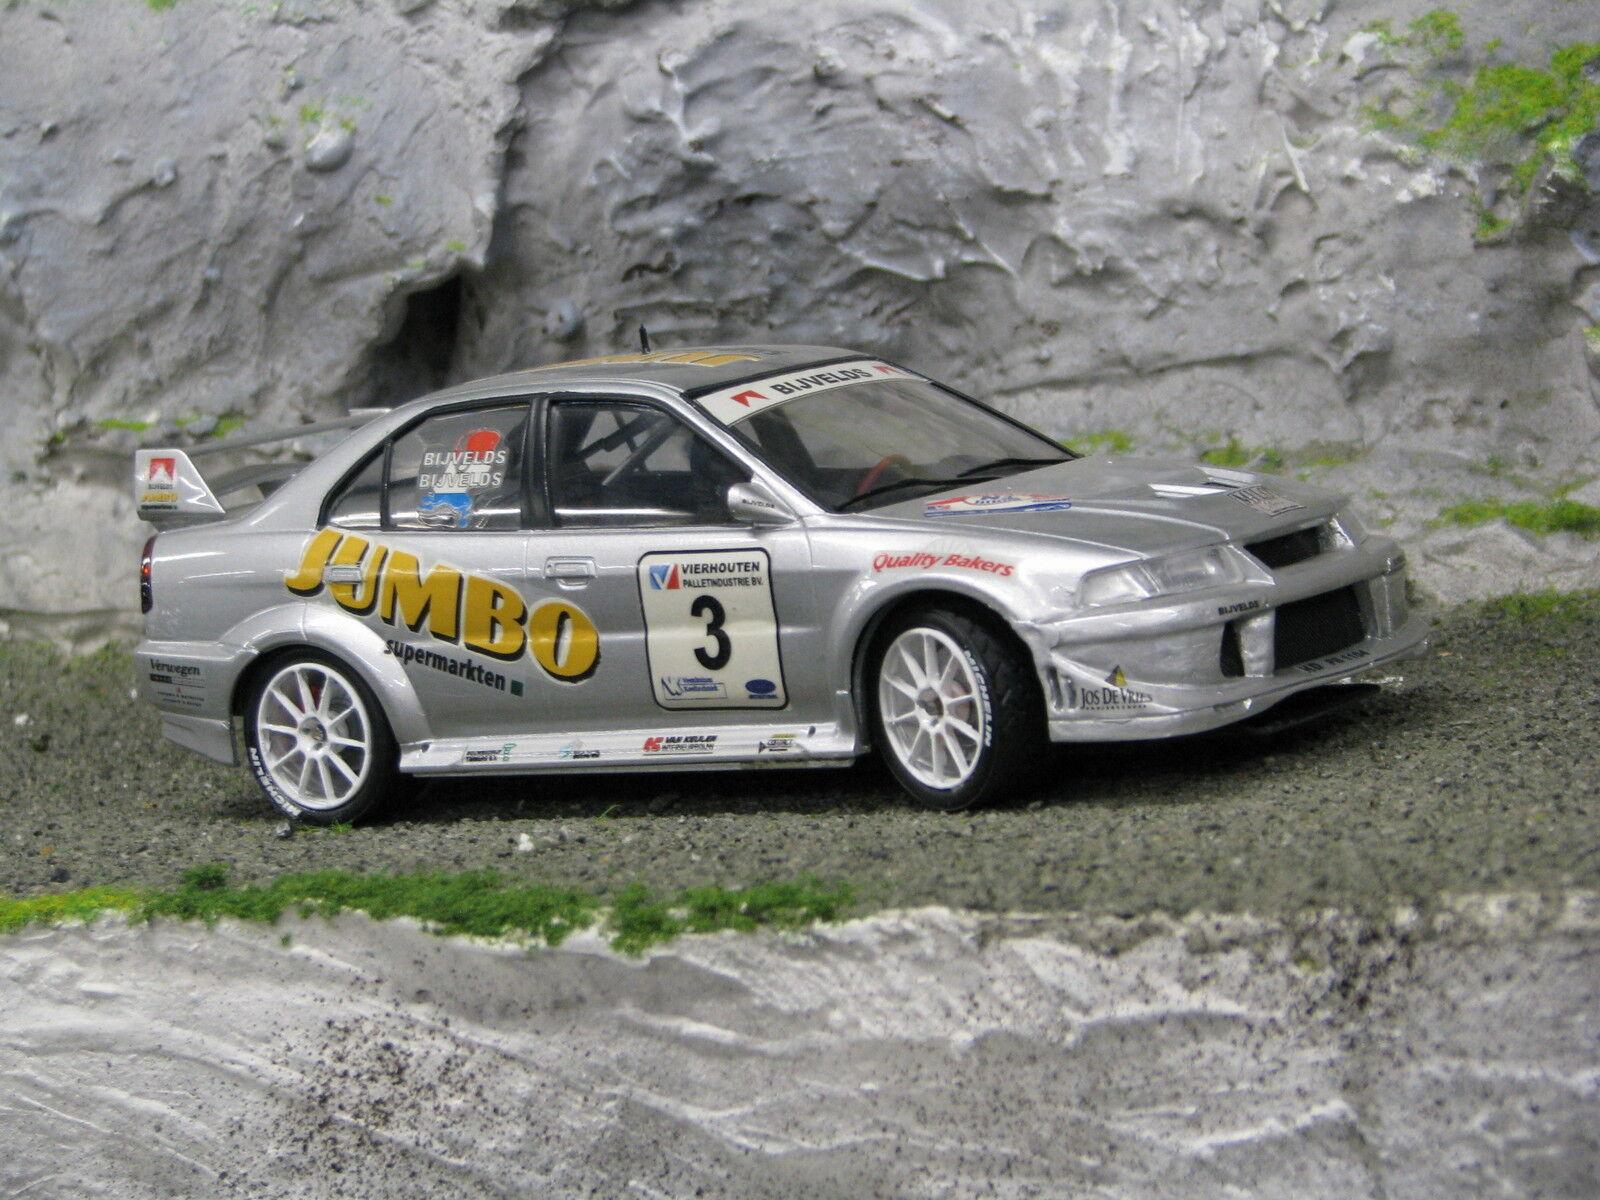 QSP Mitsubishi Lancer Evo Vl 1 24  3 Bijvelds   Bijvelds Barneveld Rally 2002